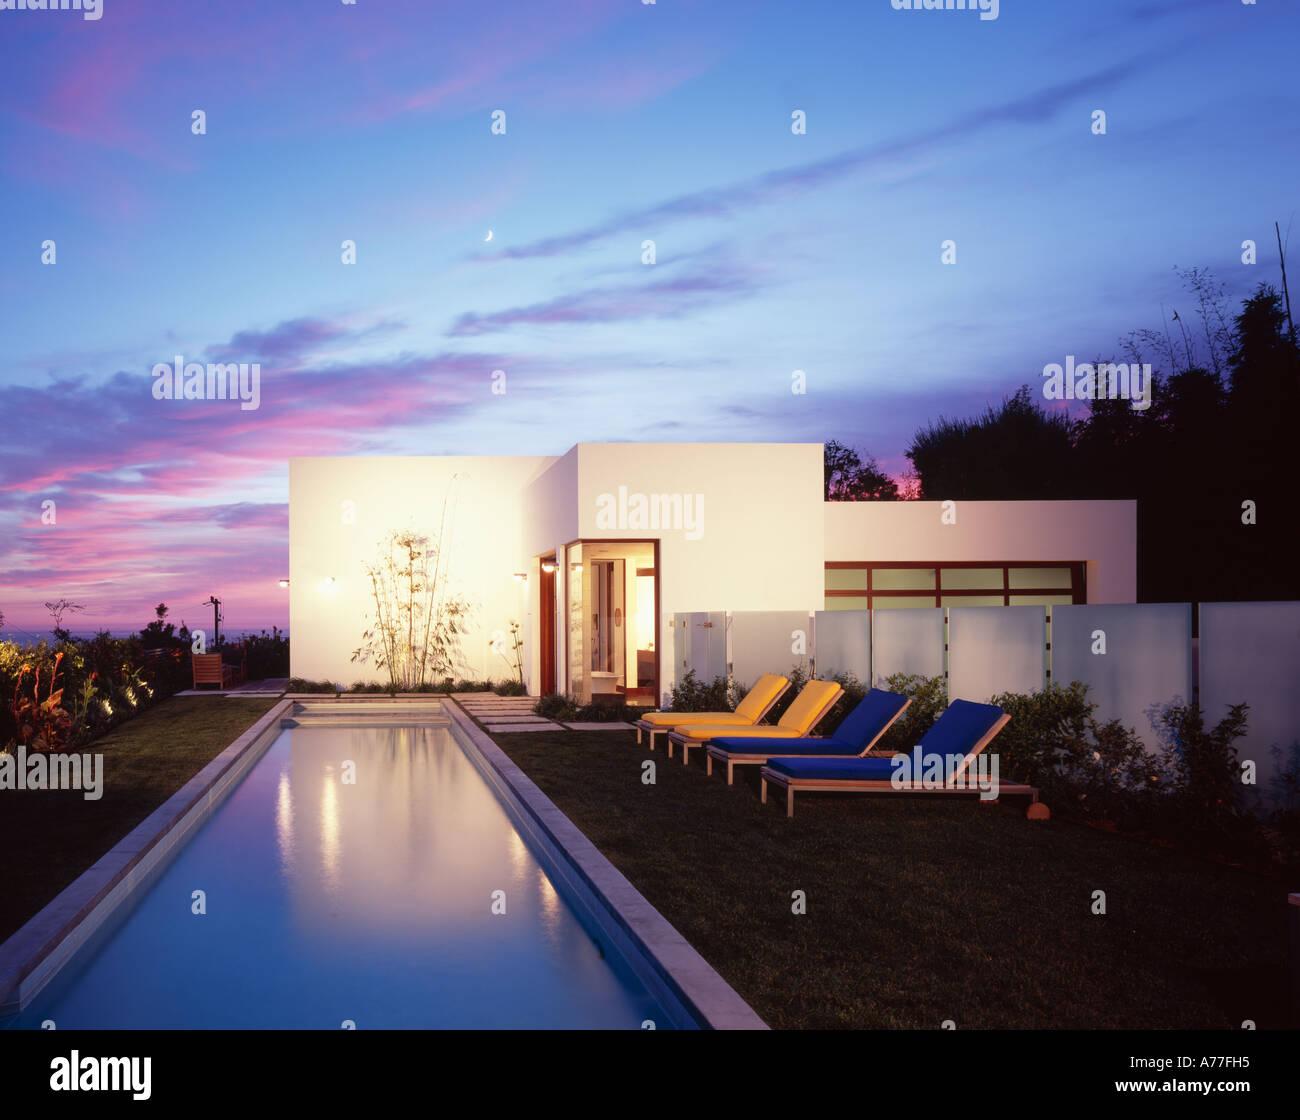 Malibu 4,  California. lengths swimming pool at dusk. Architect: Kanner Architects - Stock Image